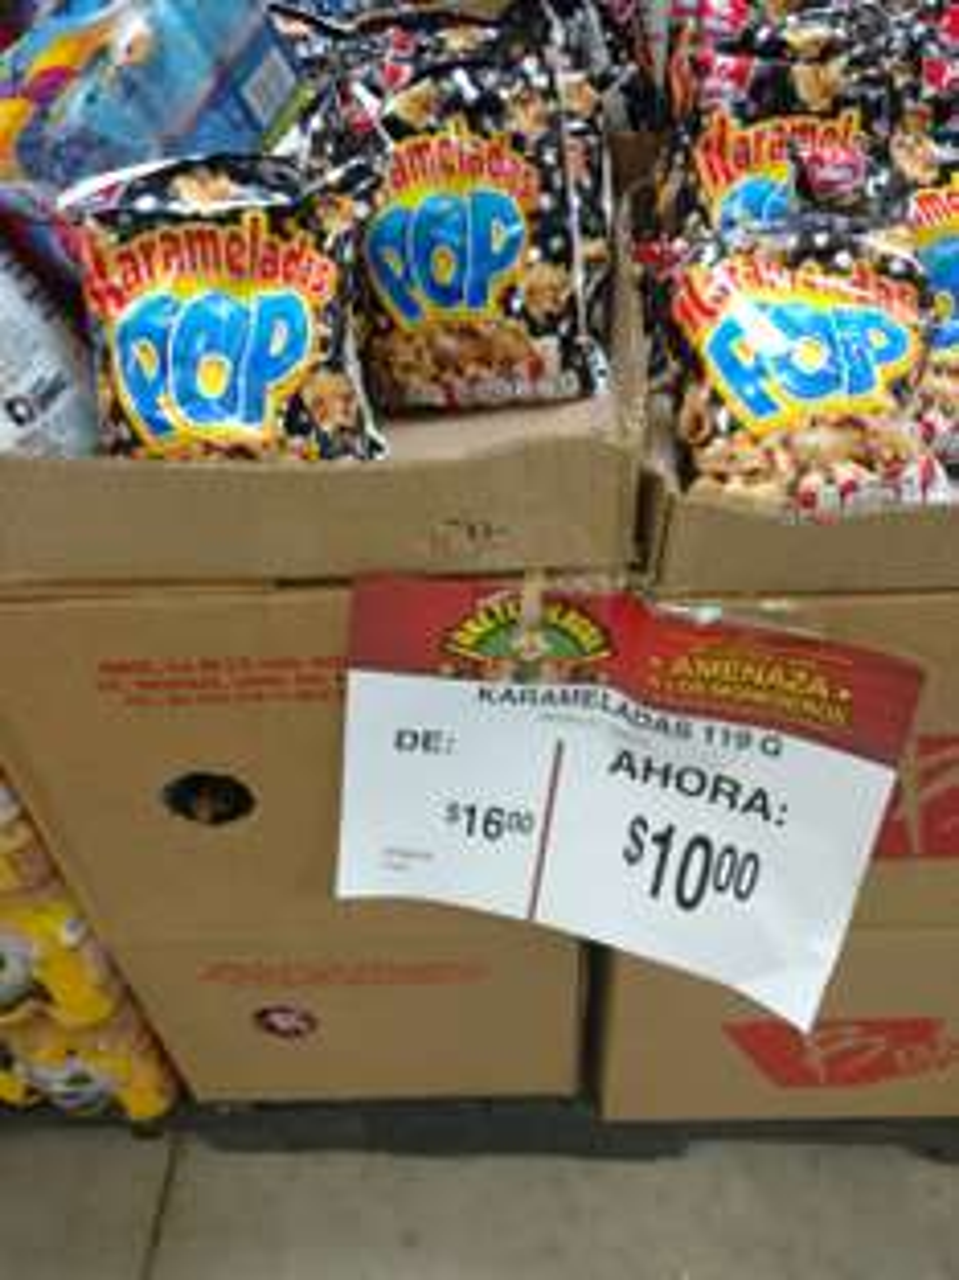 Bodega Aurrerá Lopez Portillo: Palomitas Karameladas a $10 pesos